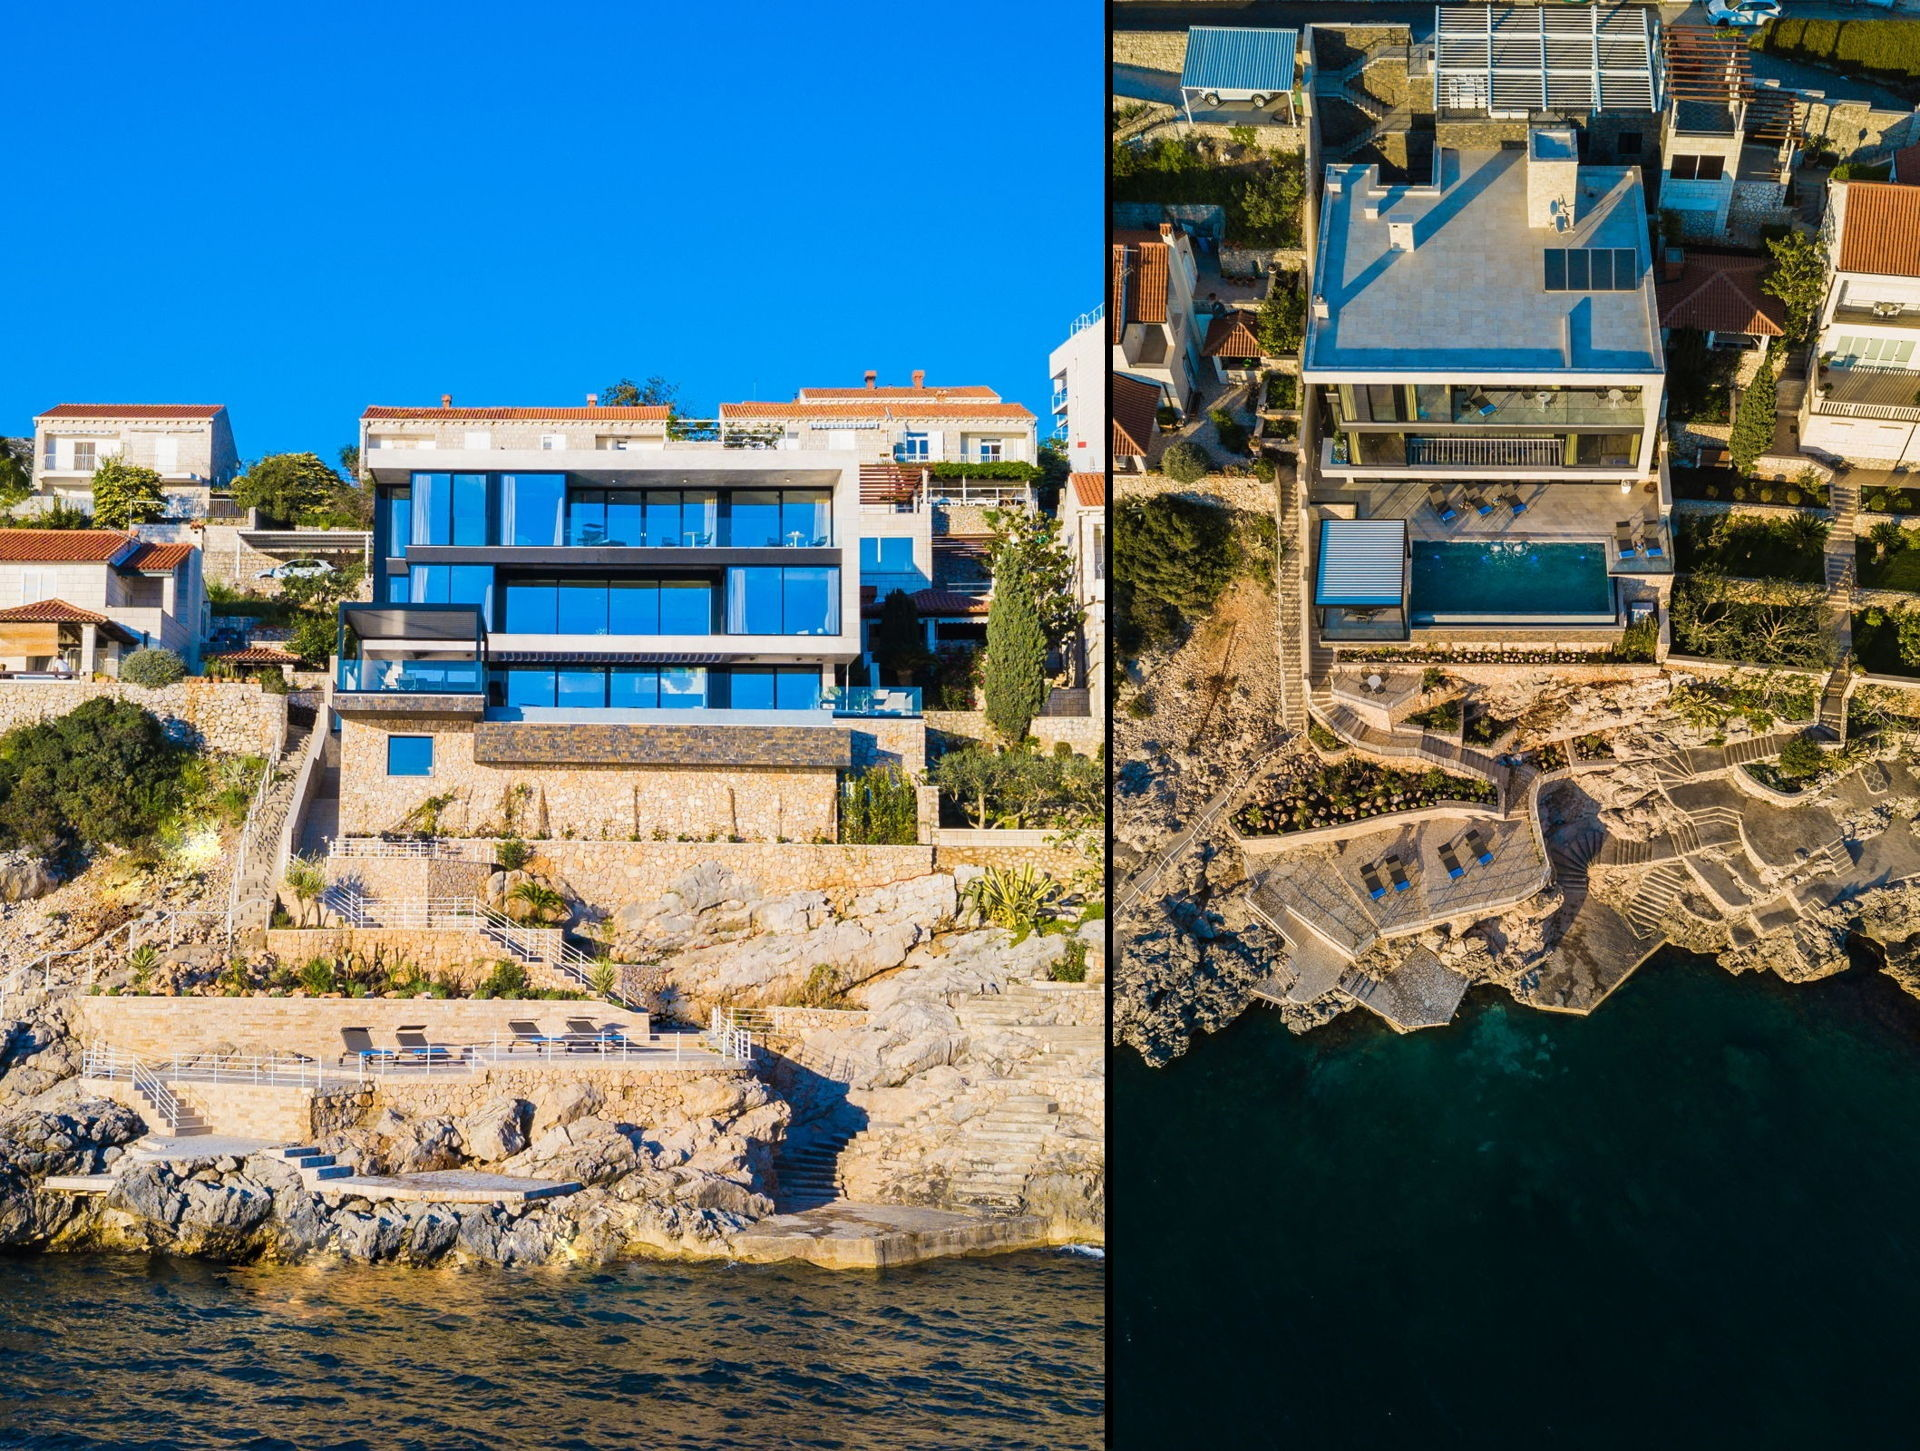 Ultraluxury Villa Grand Oceania with Infinity Pool in Dubrovnik area